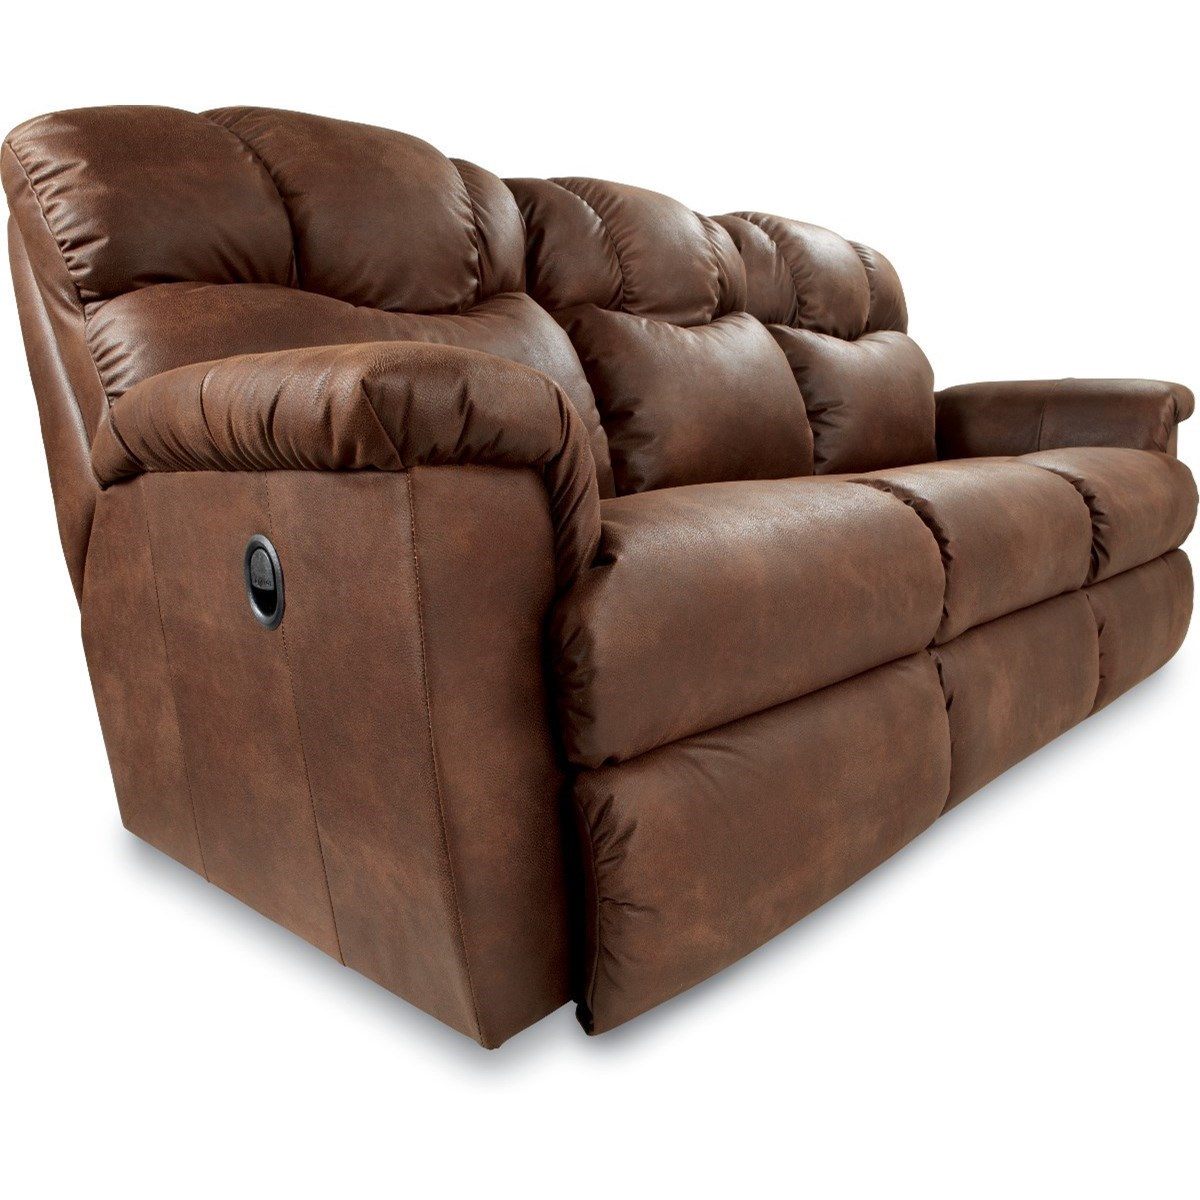 La Z Boy Hayes Casual La Z Time 174 Full Reclining Sofa With